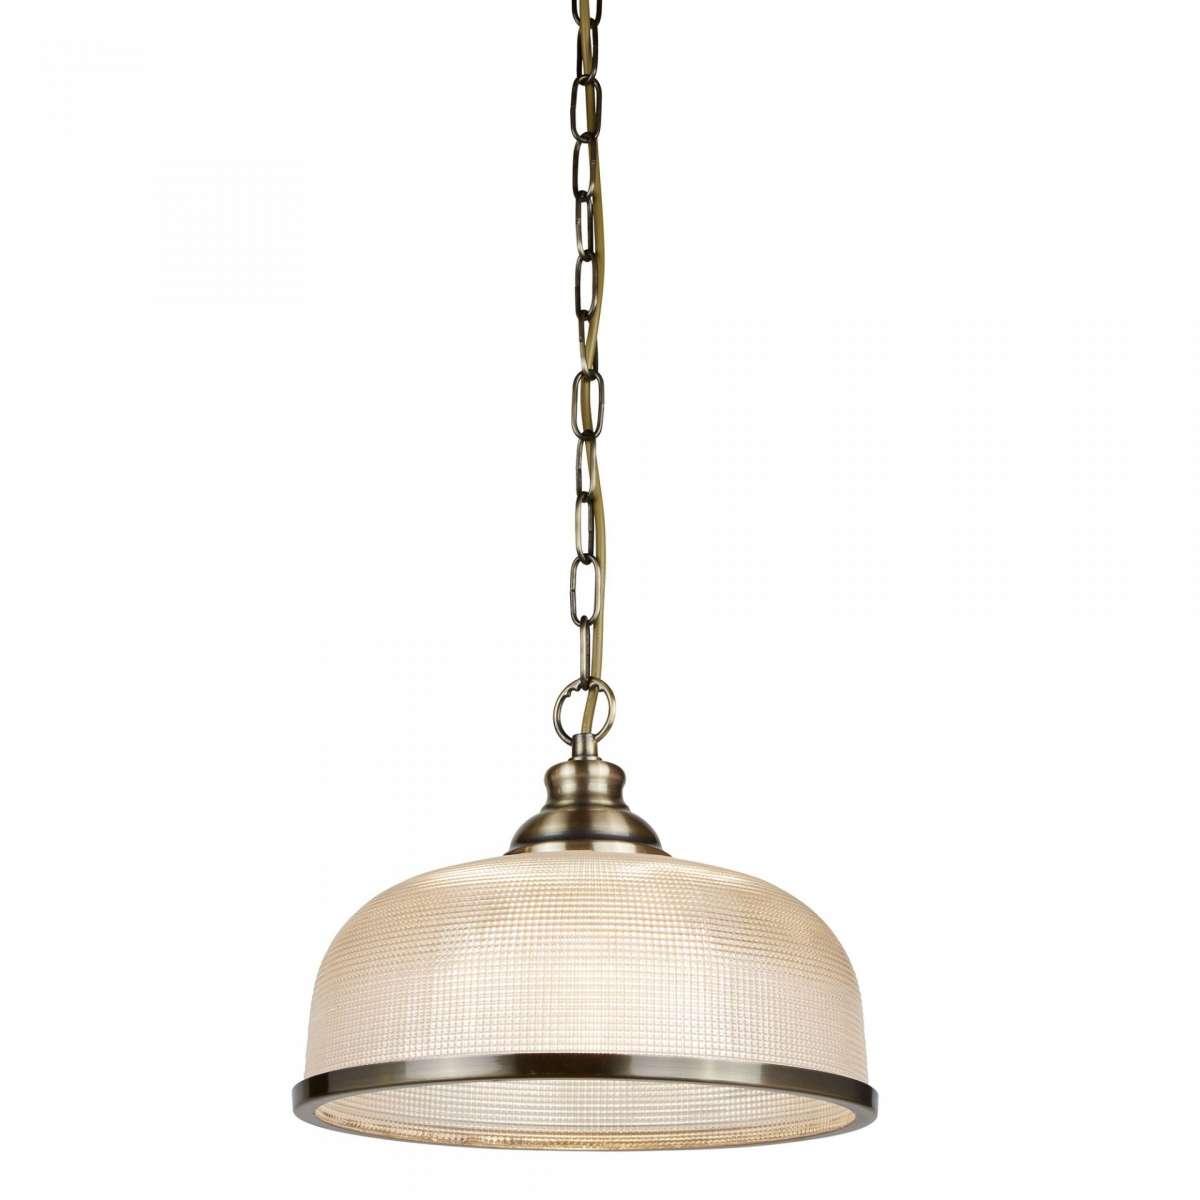 Bistro II 1 Light Pendant Antique Brass With Halophane Glass